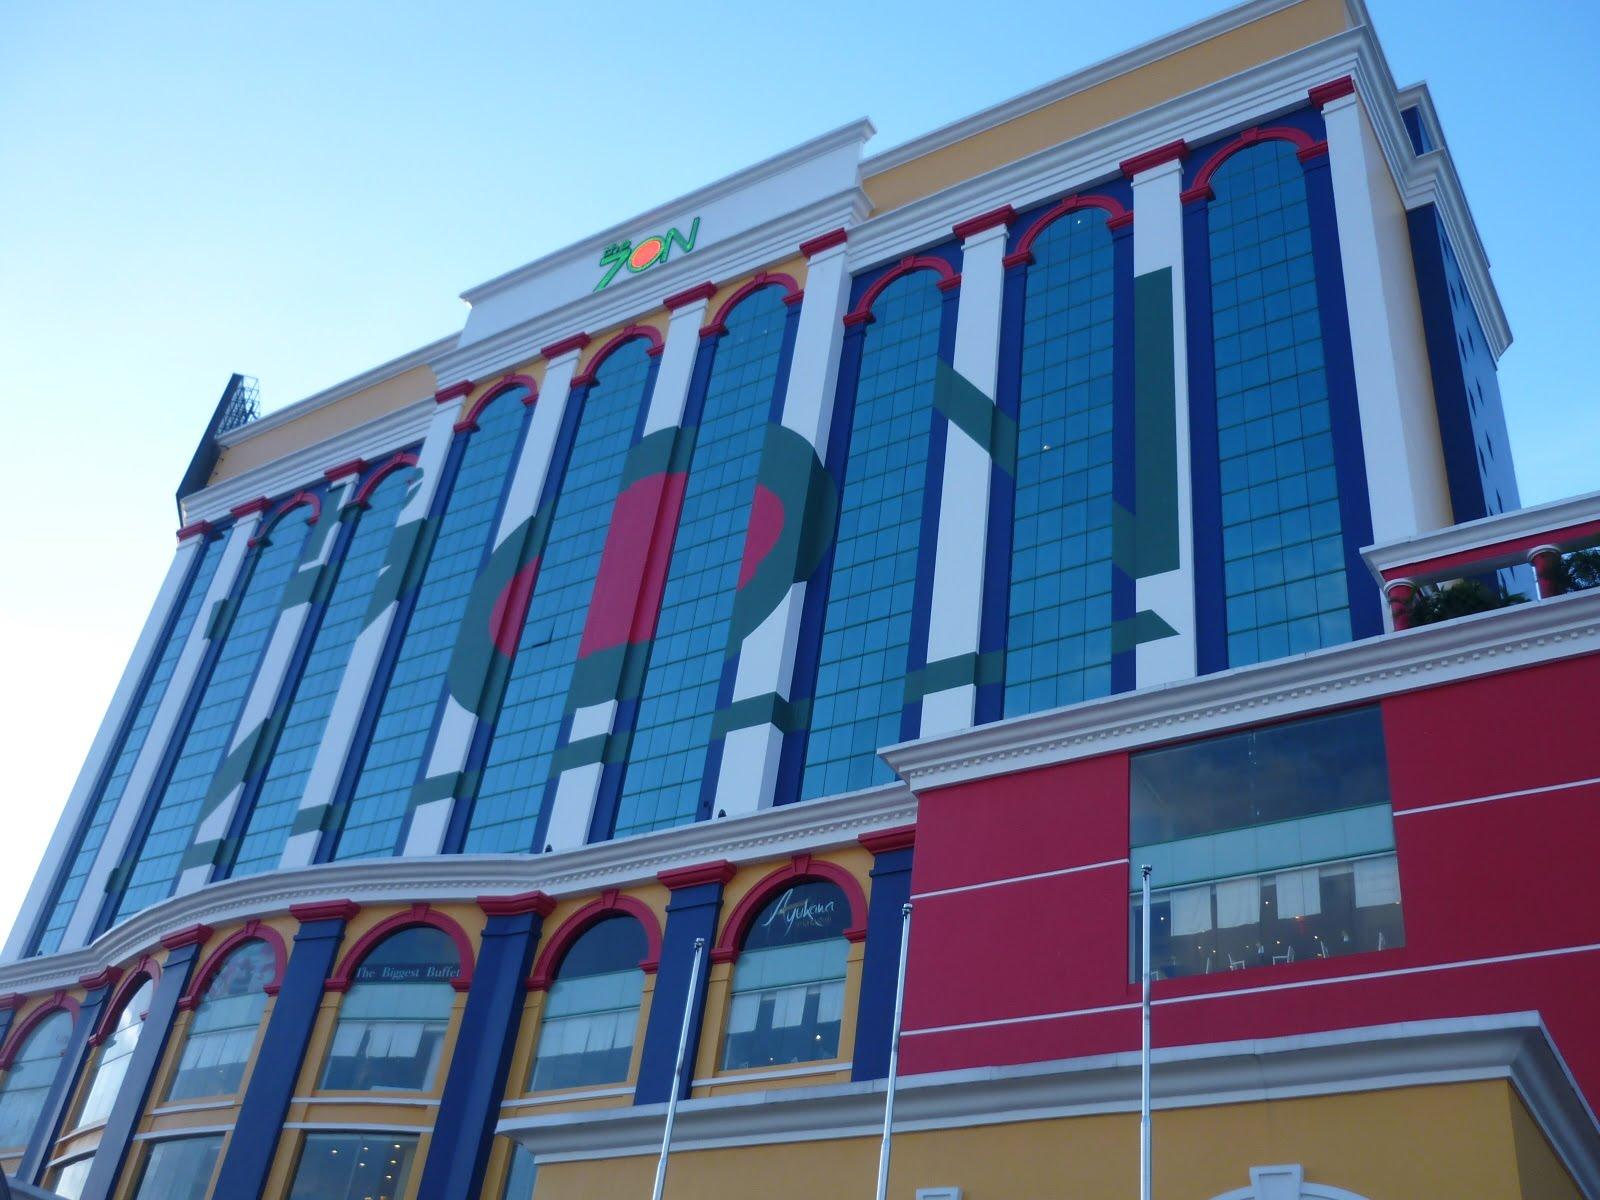 Advertorial Penginapan Di Hotel The Zon Regency, Johor. Beachcomber Shandrani Resort & Spa. Palladio Hotel. Augustiniansky Dum Hotel. Avari Hotel. Resort Obertraun. Hotel Altes Kloster. Hotel Riva Del Sole. Nine Plus Spa Hot Spring Hotel